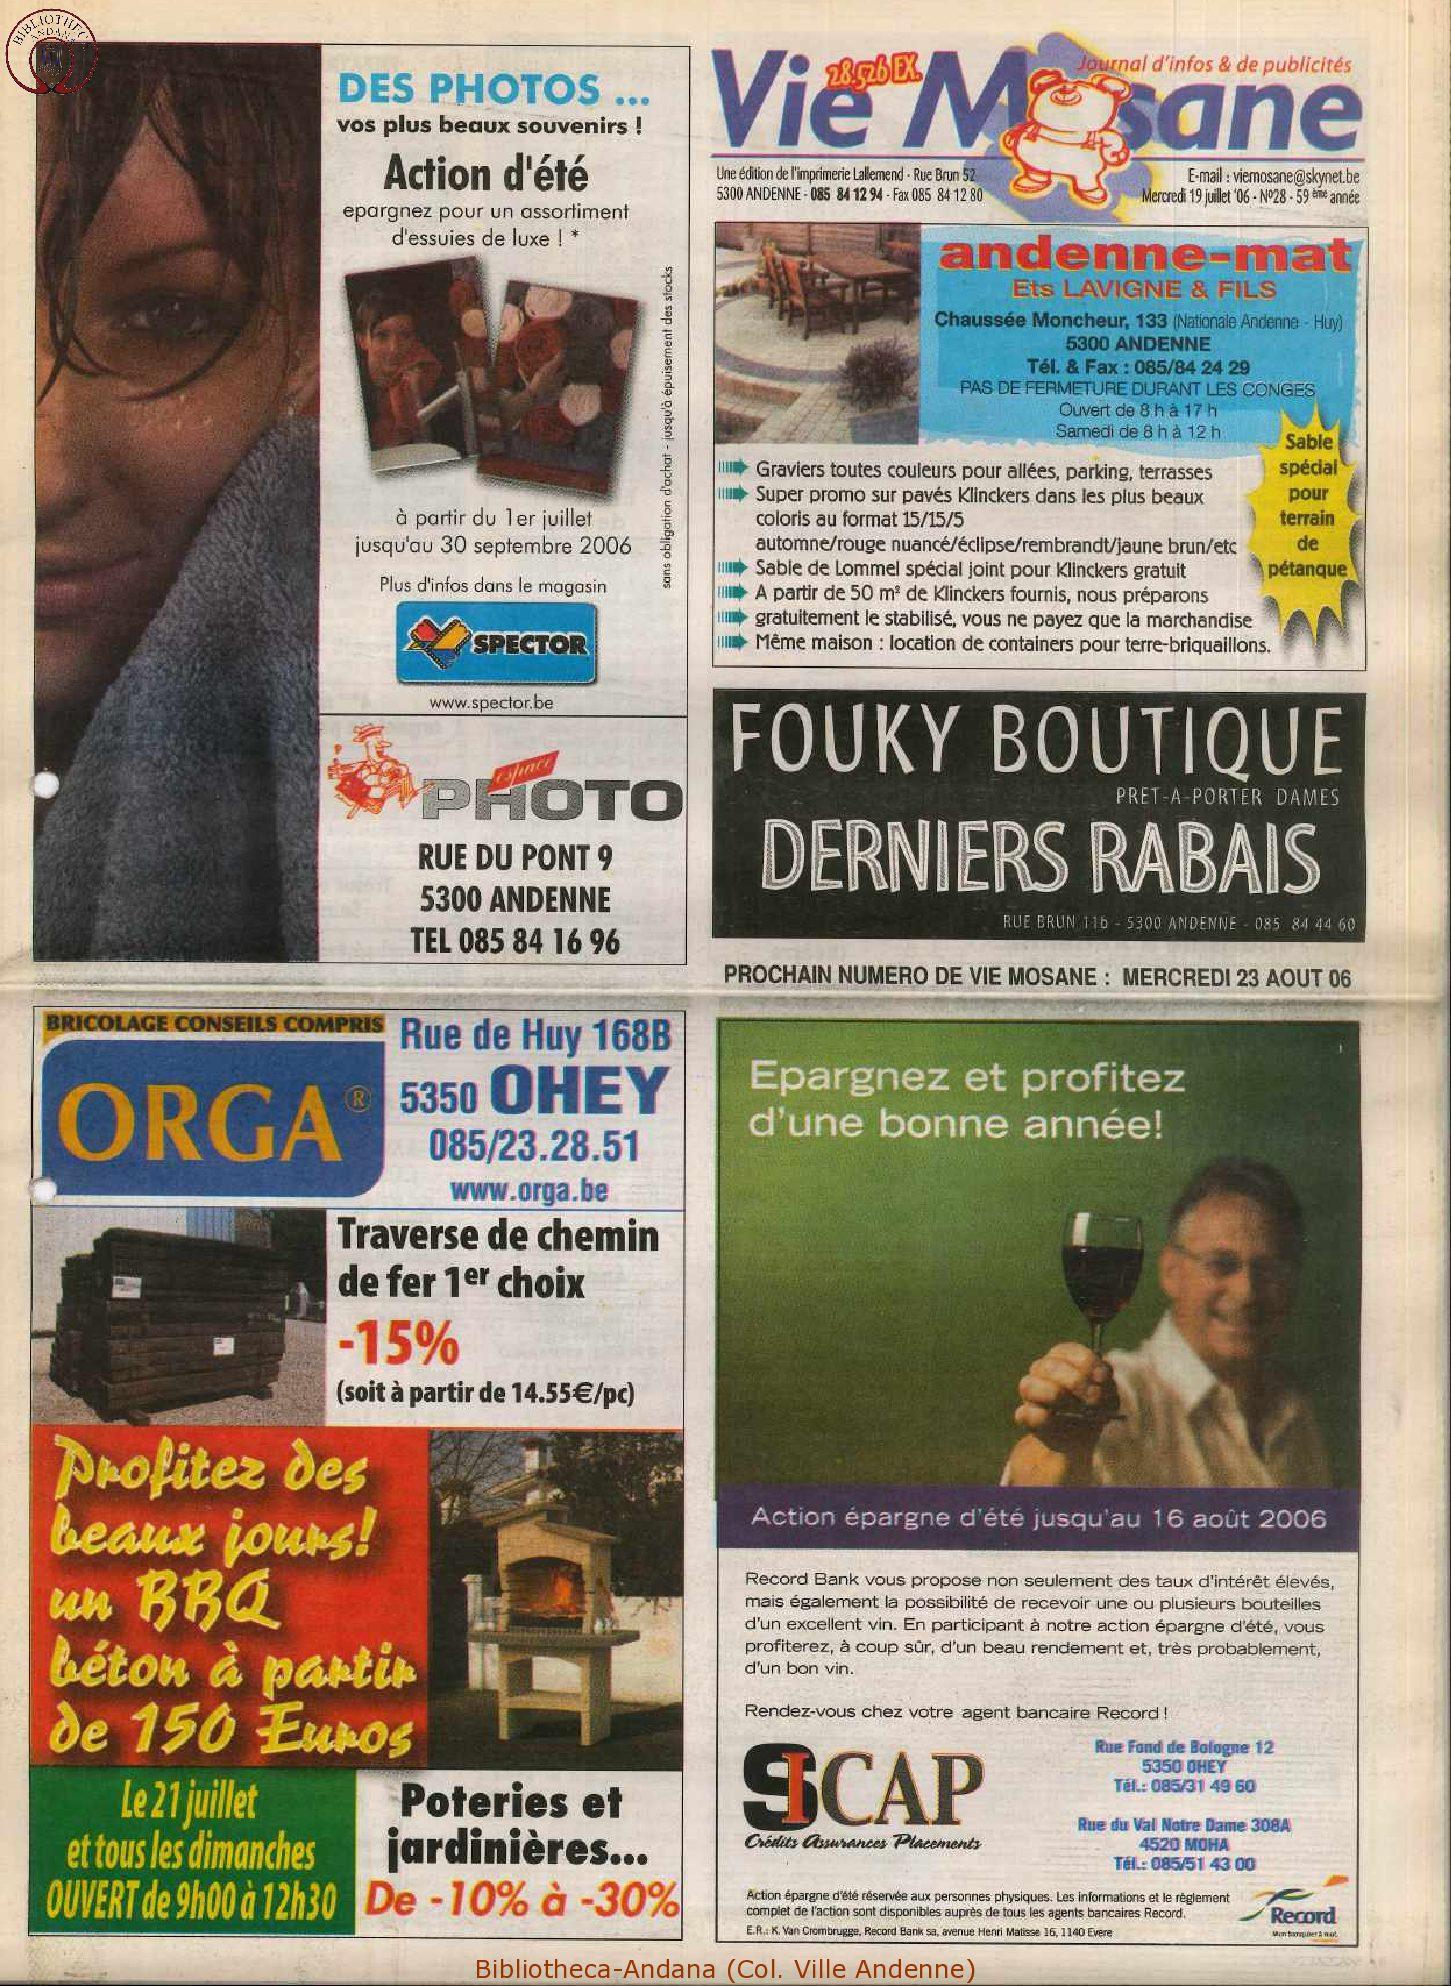 59e année - n°28 - 19 juillet 2006